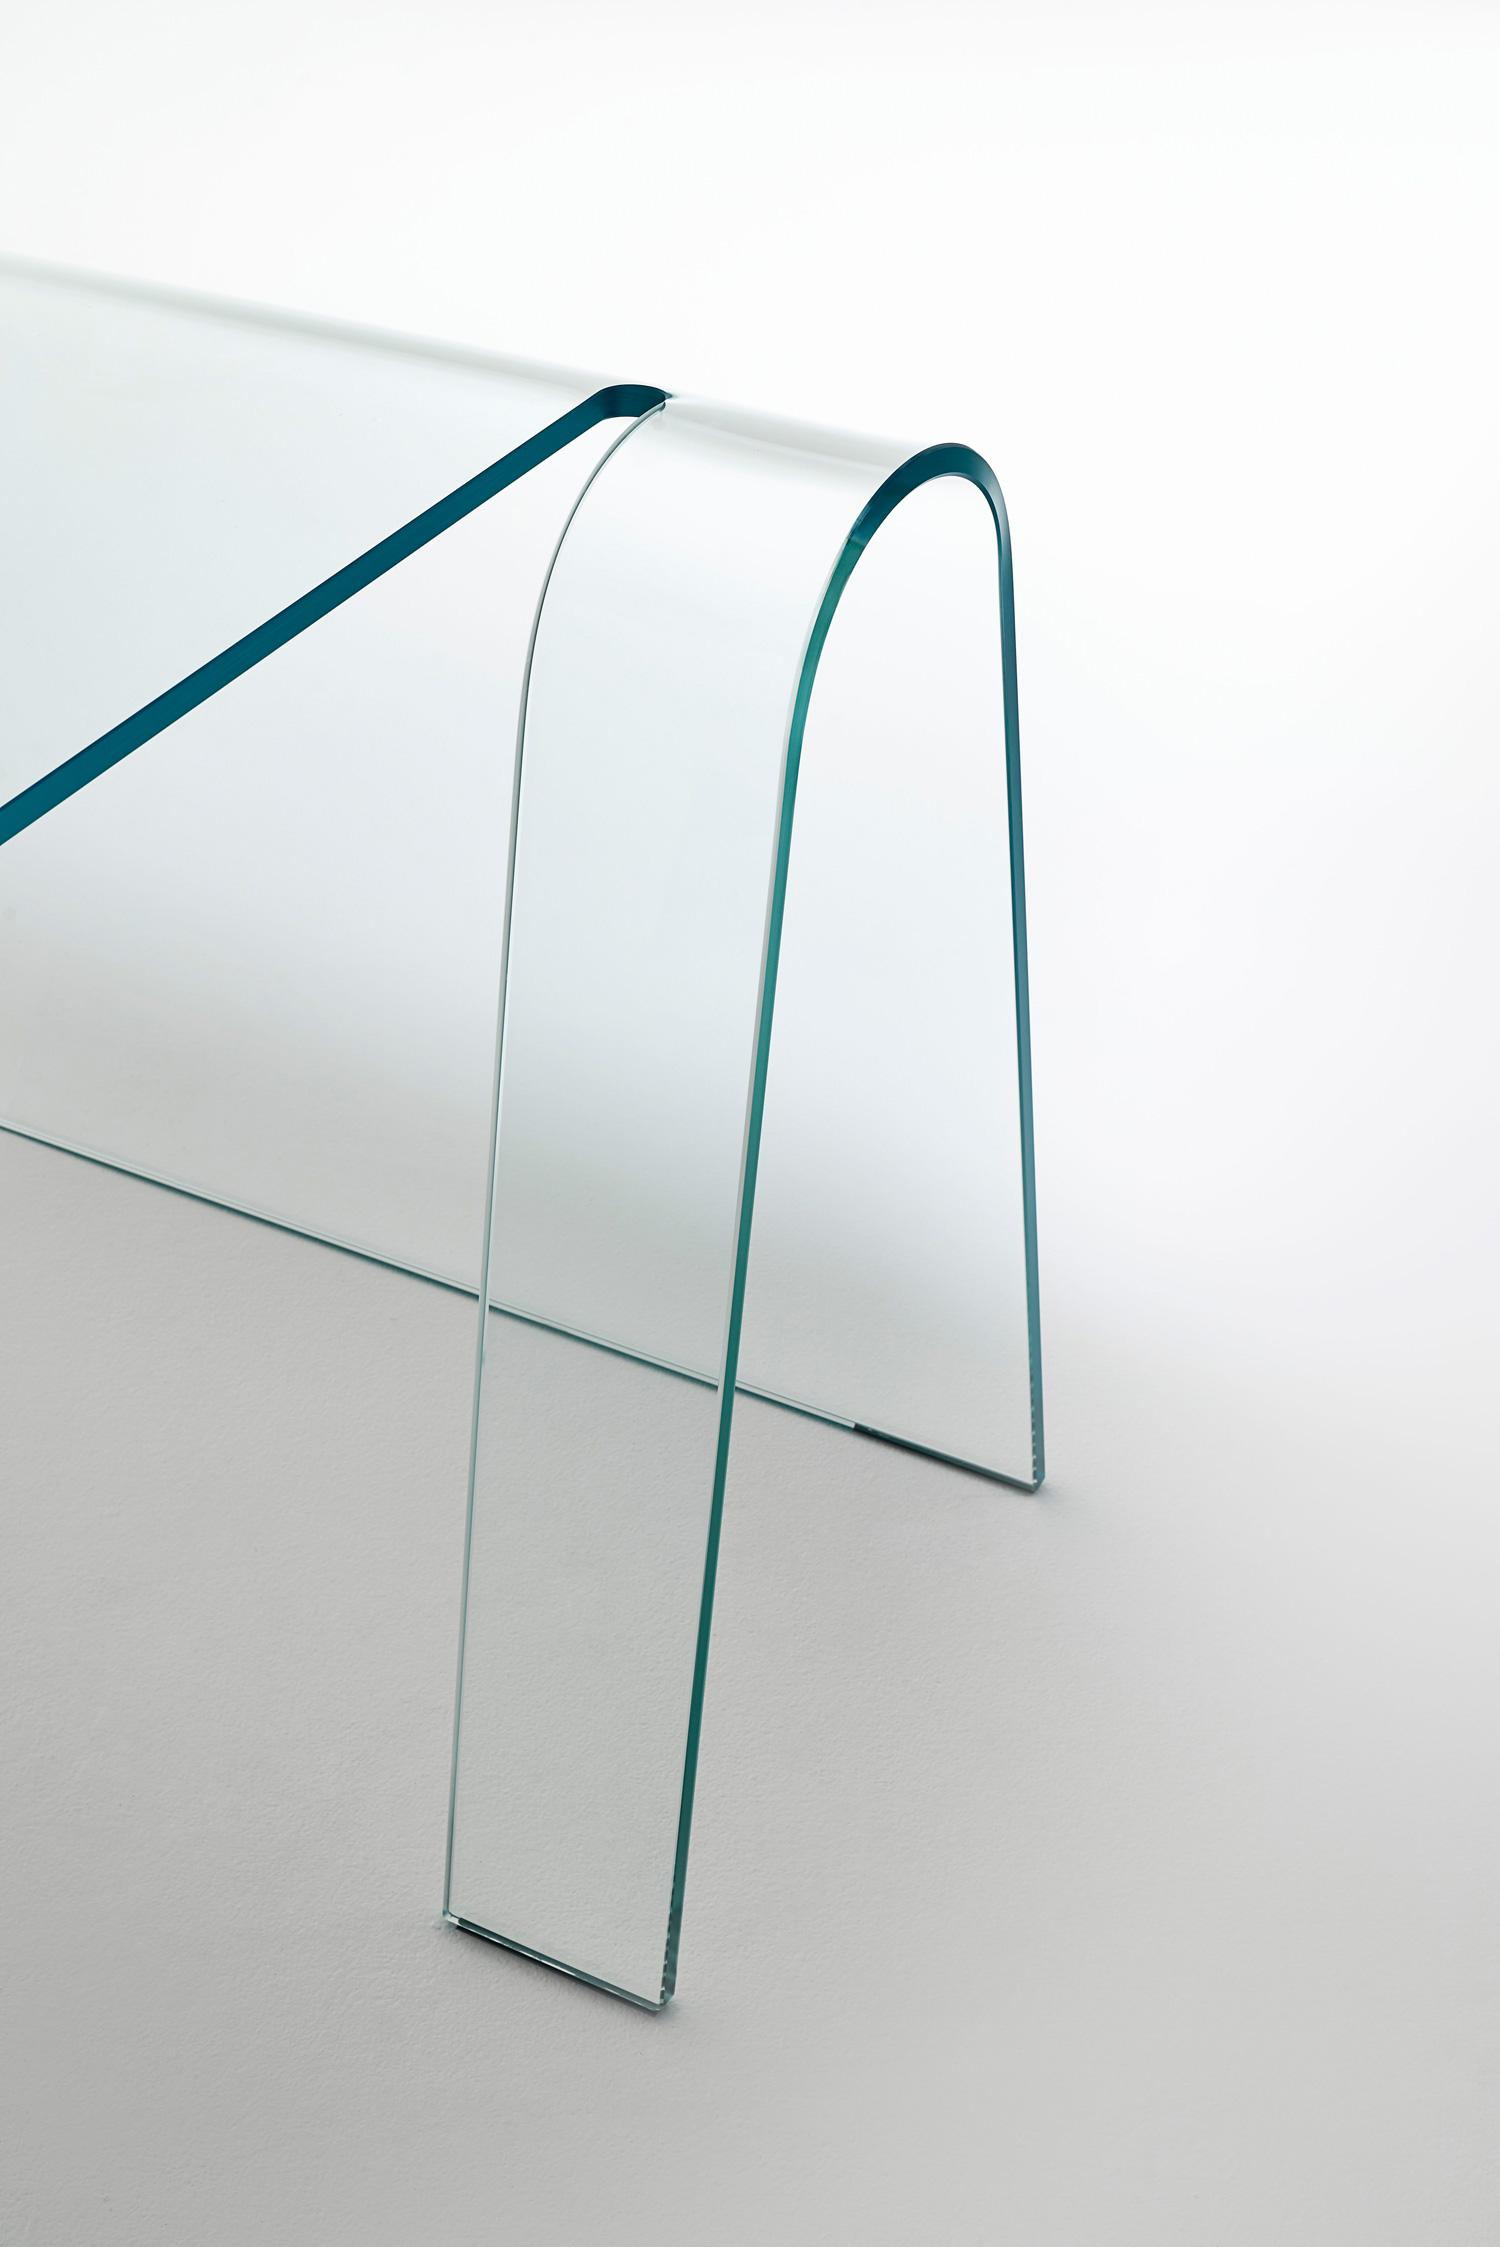 Folio by Yabu Pushelberg for Glass Italia at Salone del Mobile 2017 | Yellowtrace